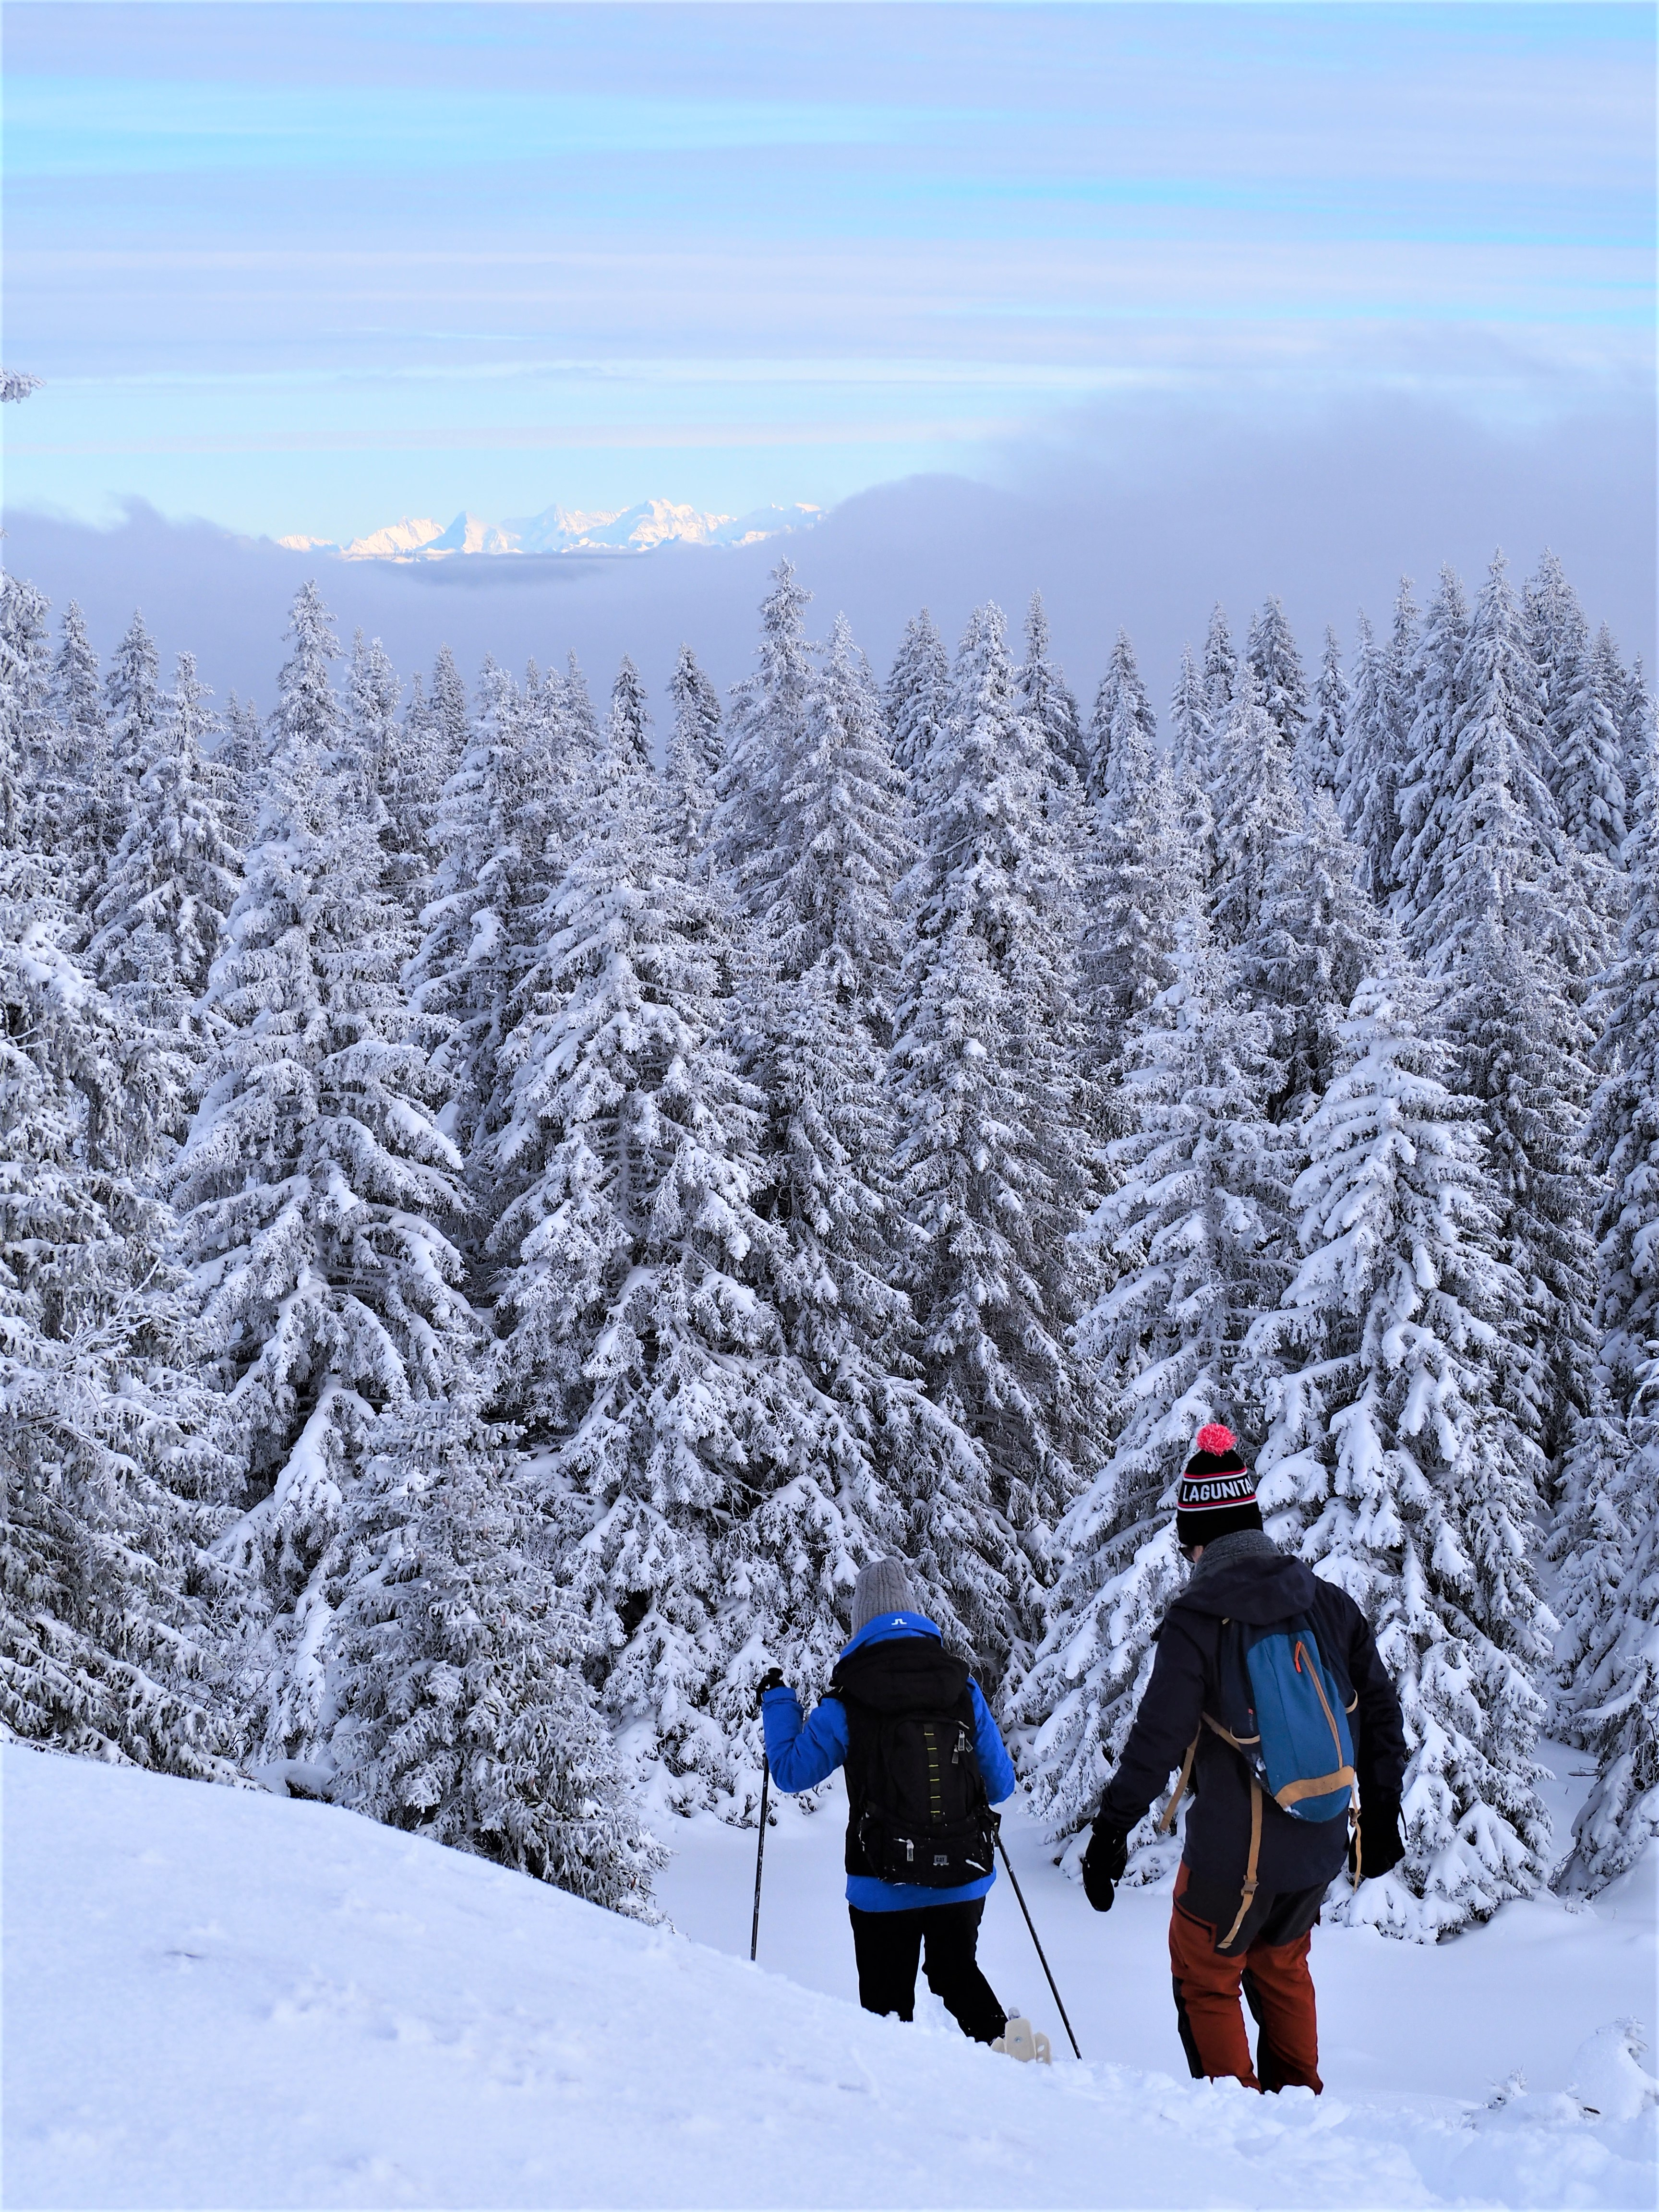 canton-de-vaud-randonnee-trail-mont-tendre-clioandco-blog-voyage.